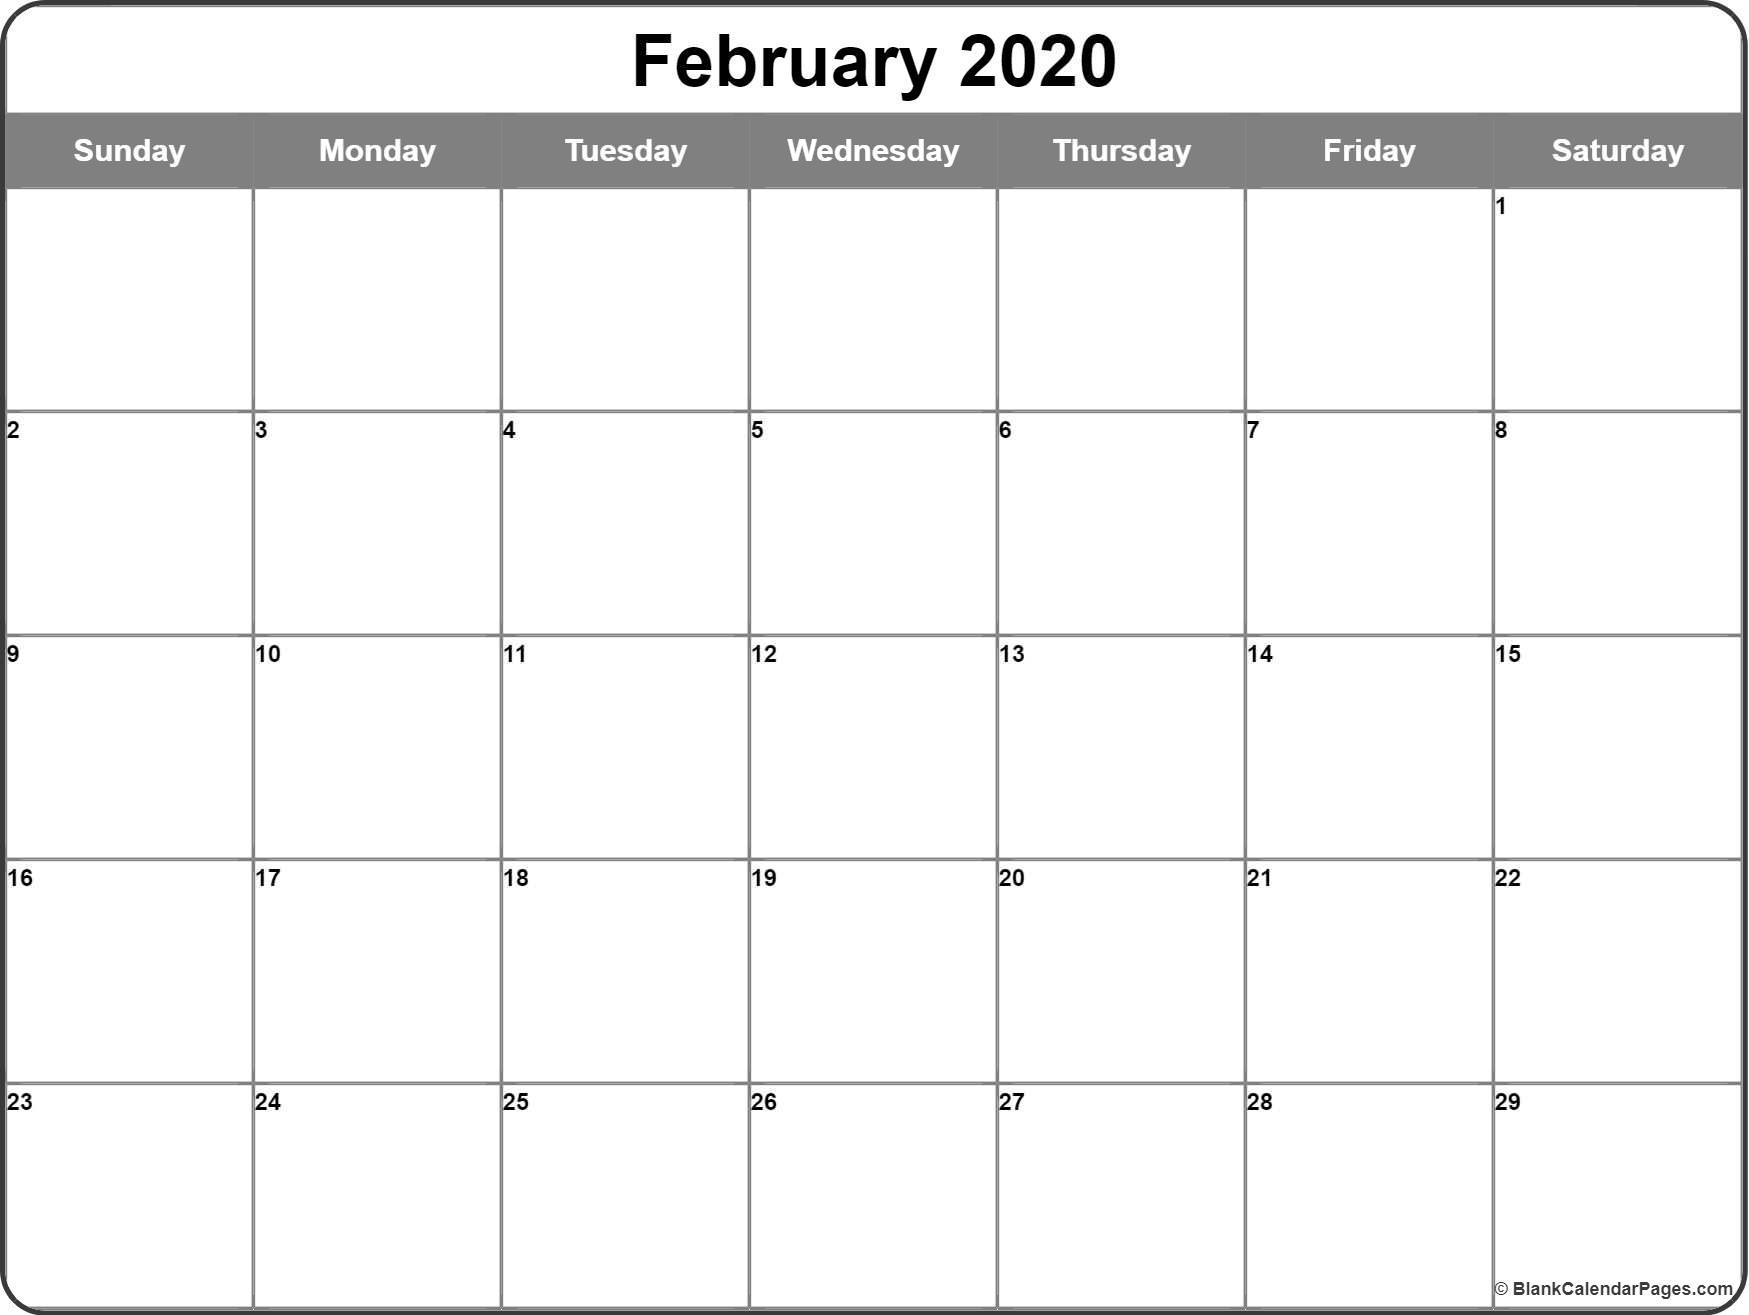 February 2020 Calendar | Free Printable Monthly Calendars regarding Free Printable Calander 2020 Victoria Wiht Spaces To Write